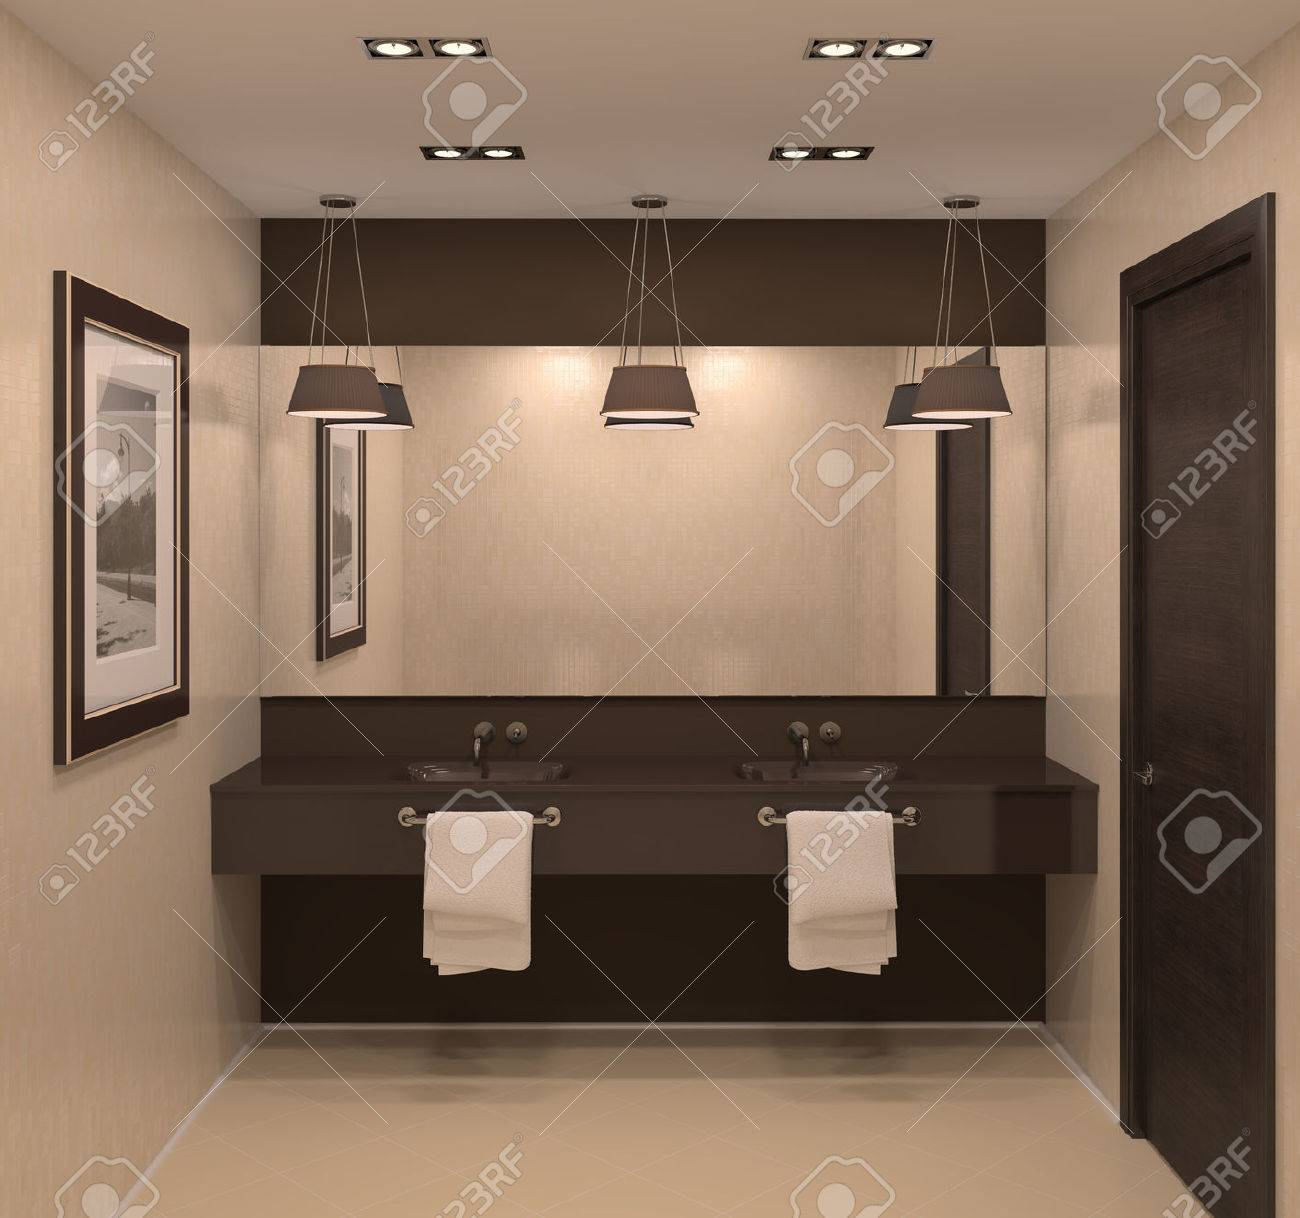 Modern bathroom interior. 3d render. - 44828750